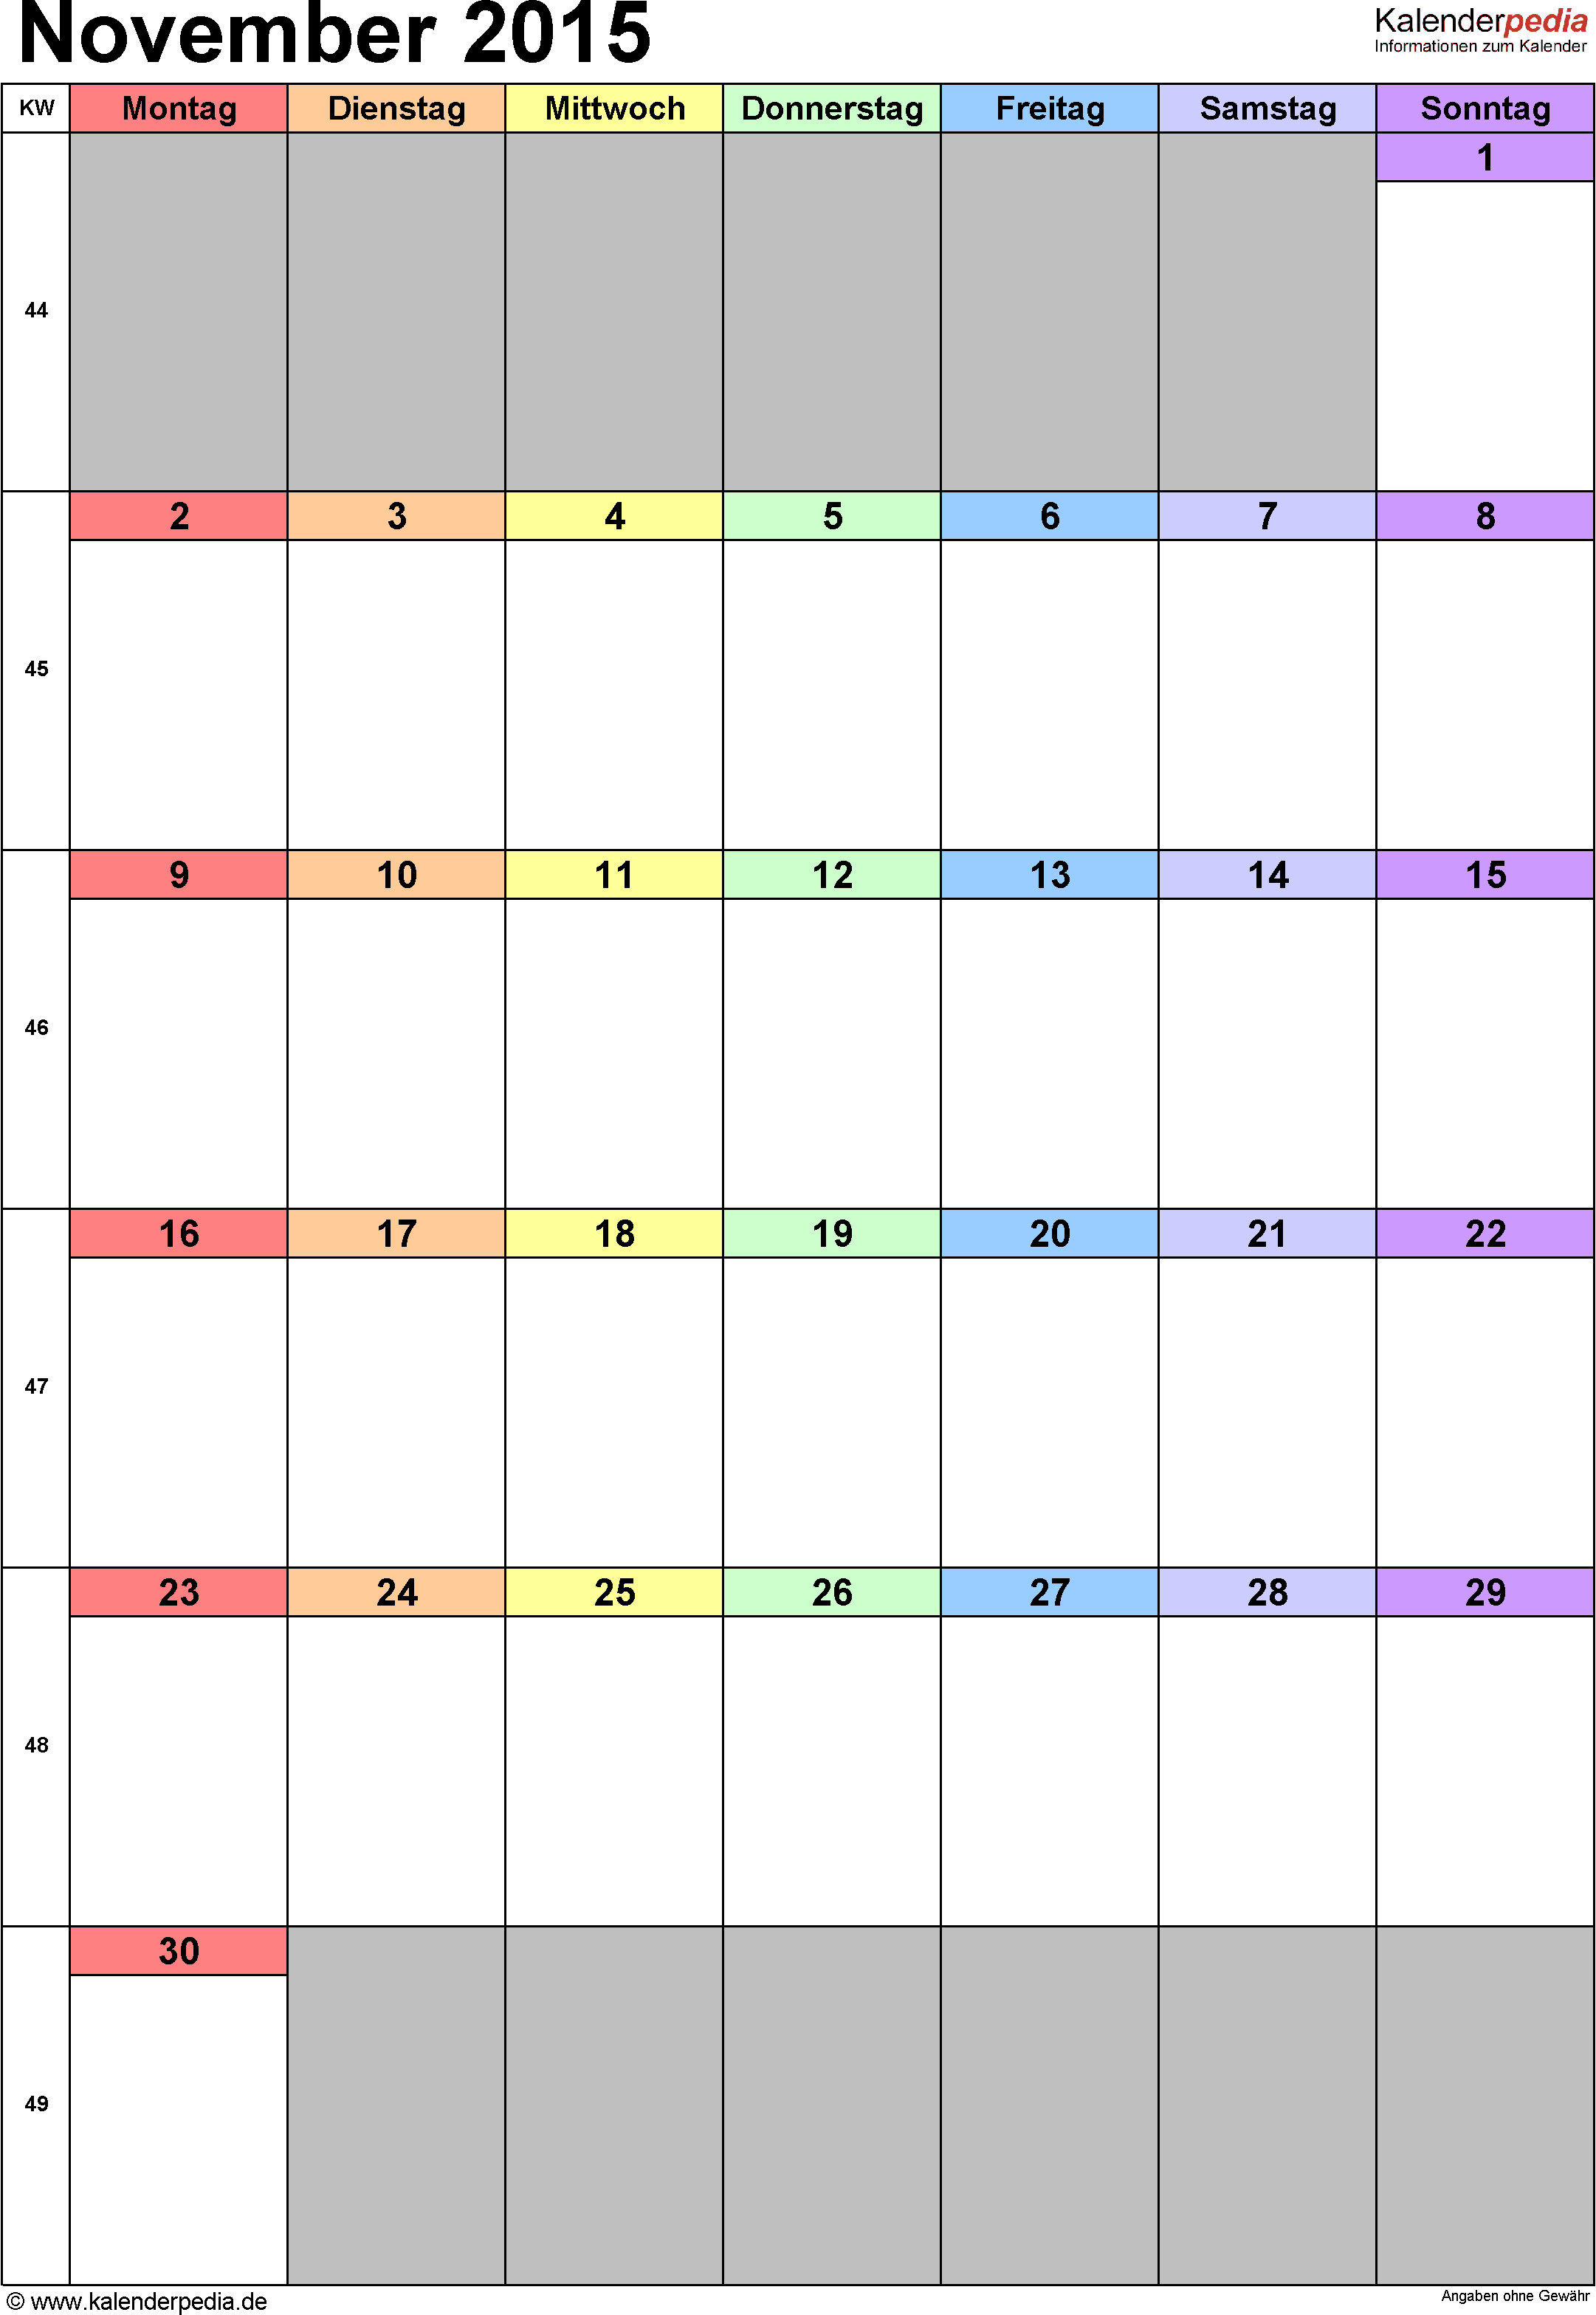 Kalender November 2015 (Hochformat) als Excel-Vorlage